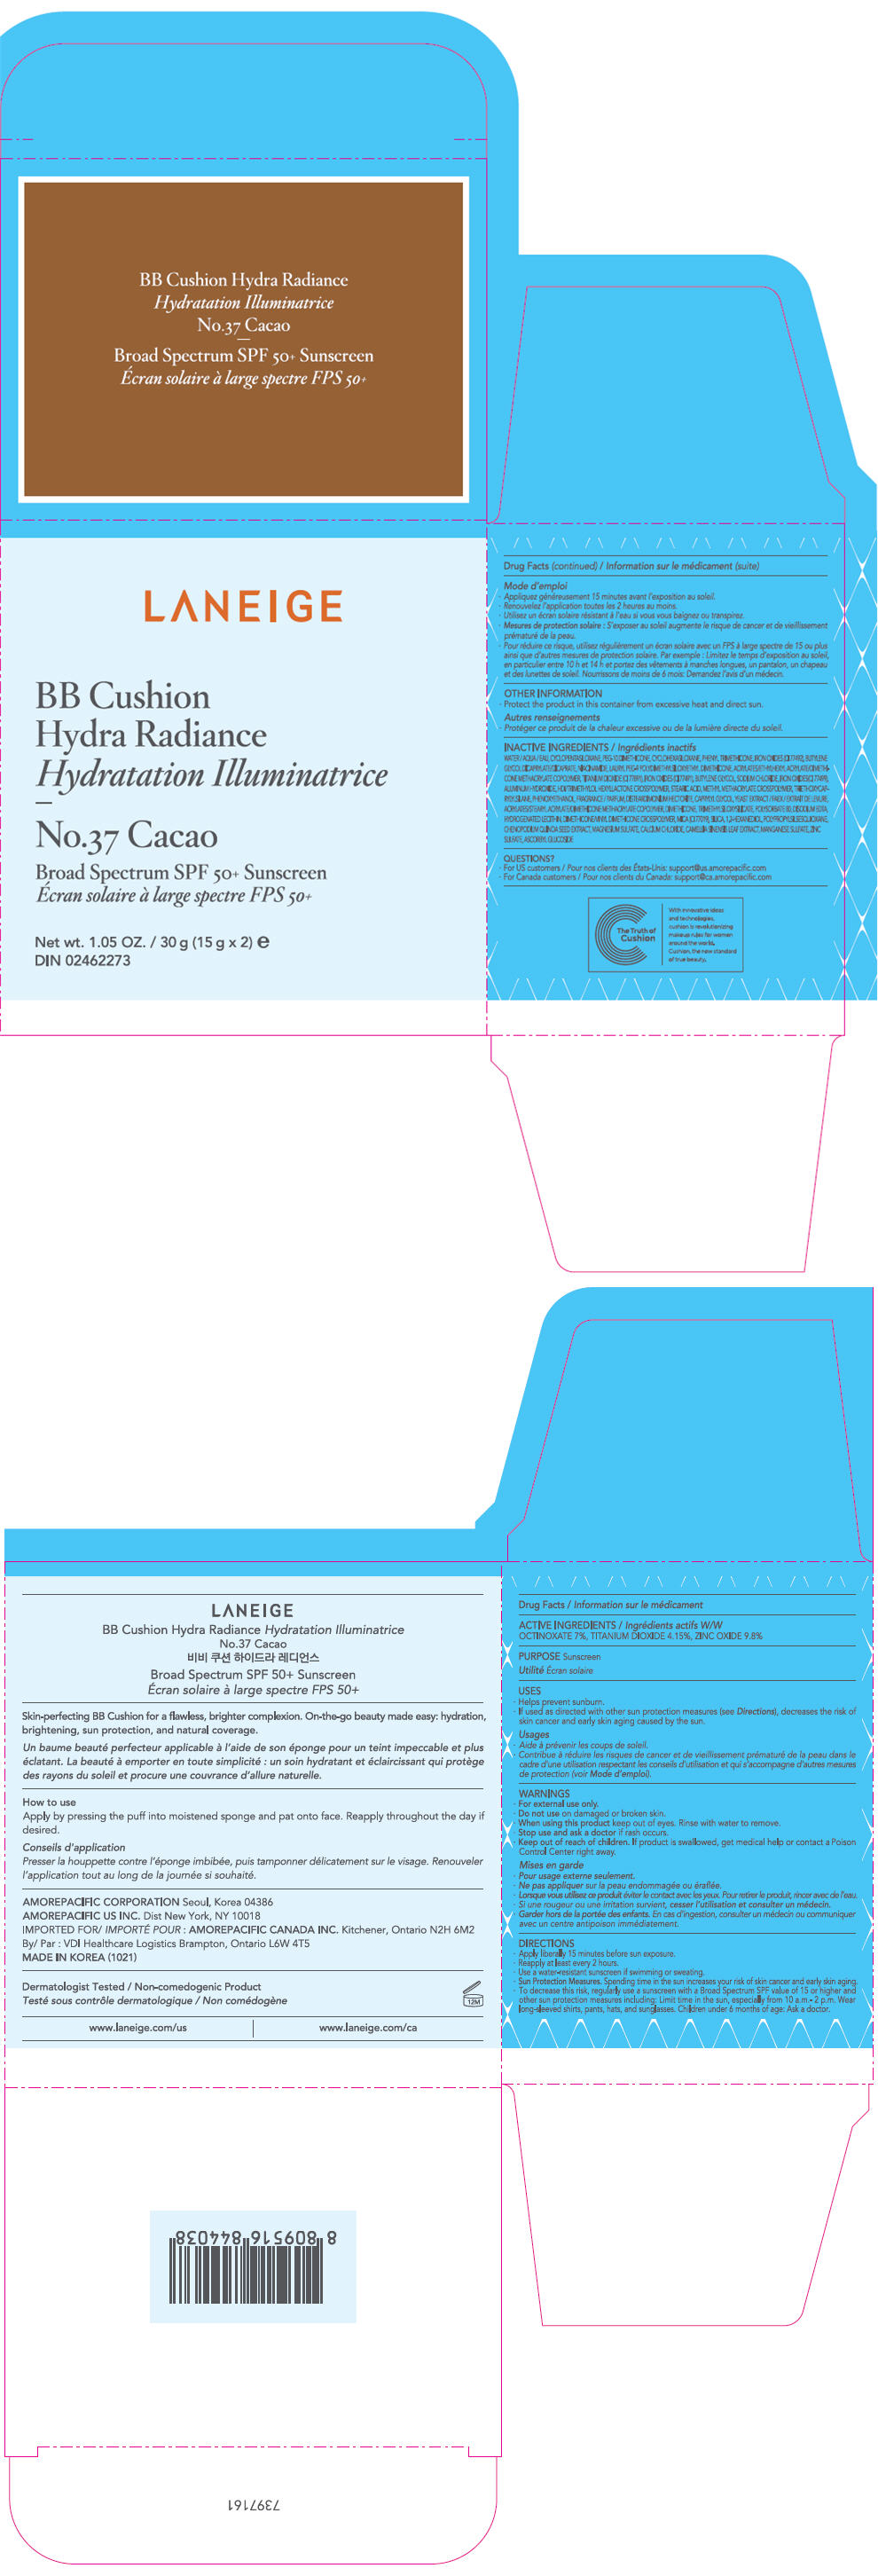 PRINCIPAL DISPLAY PANEL - 15 g x 2 Container Carton - No.37 Cacao